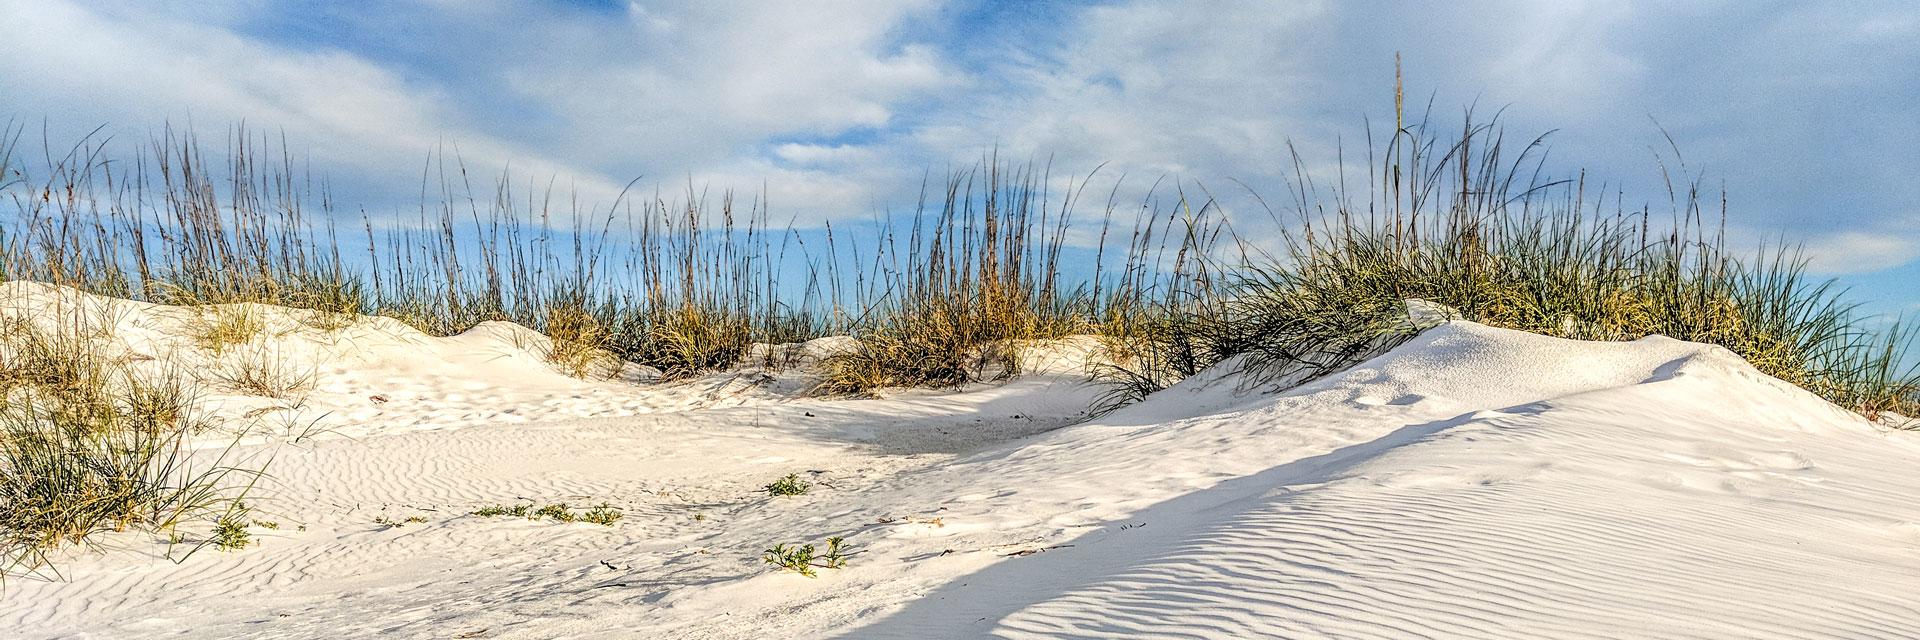 Anna Maria Island sand dunes